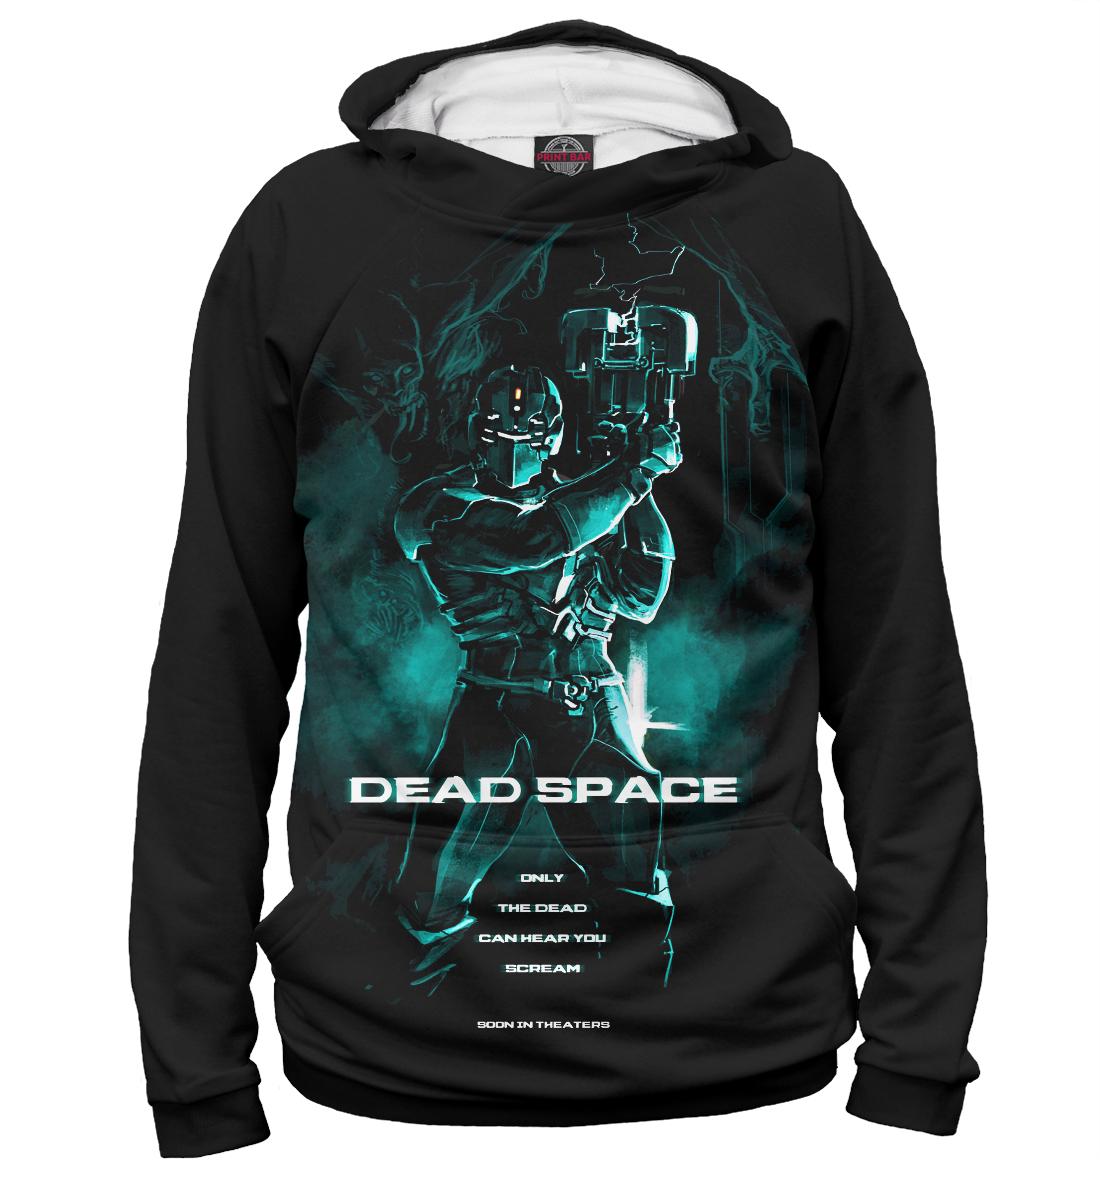 Купить Dead Space, Printbar, Худи, RPG-170022-hud-2